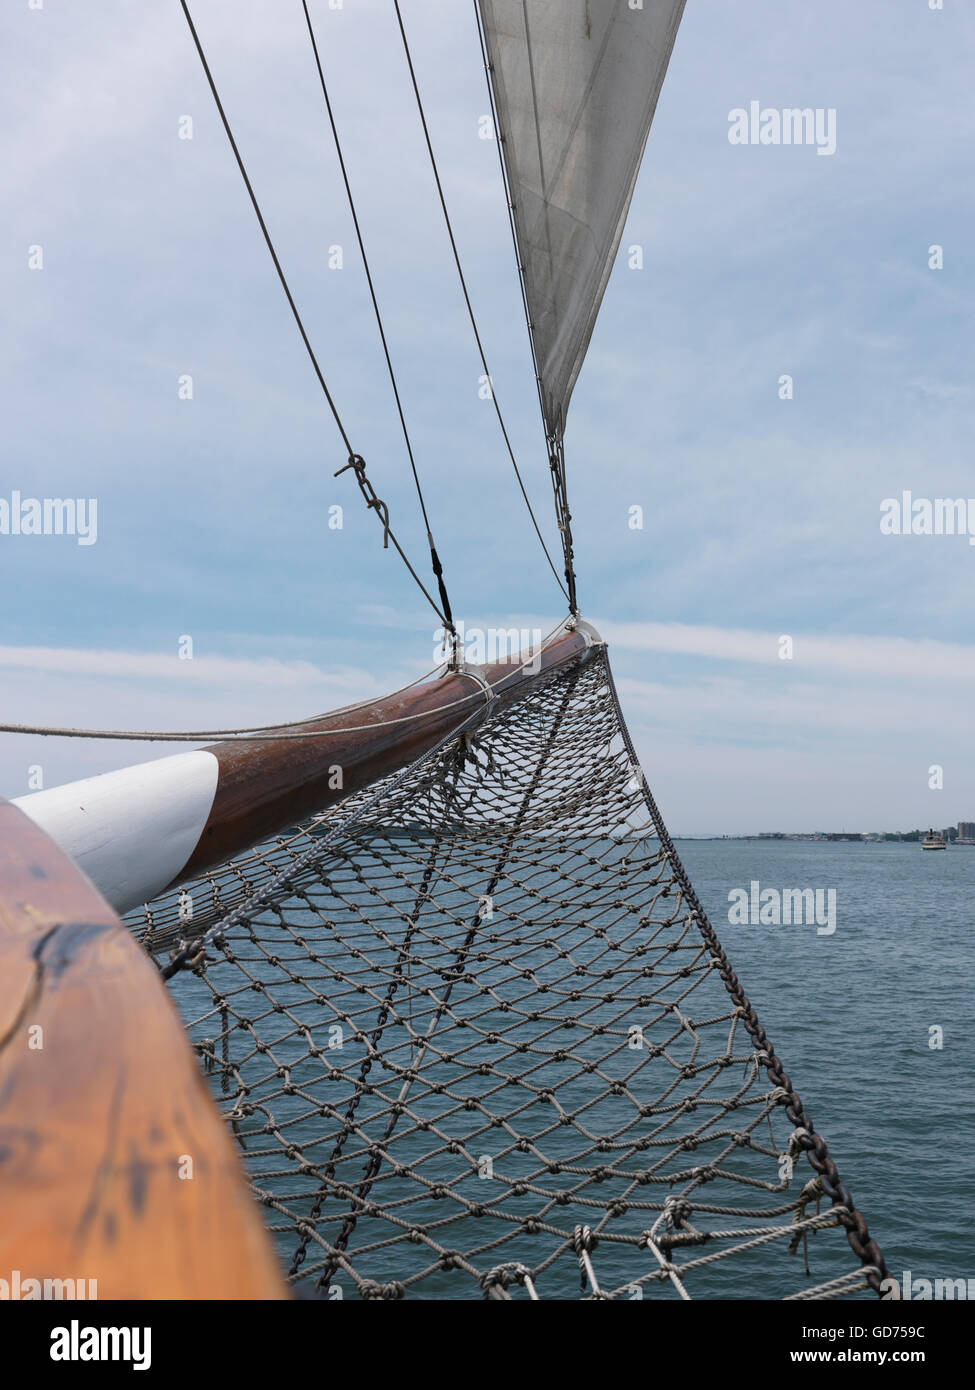 Closeup of a tall ship sailing vessel bowsprit - Stock Image